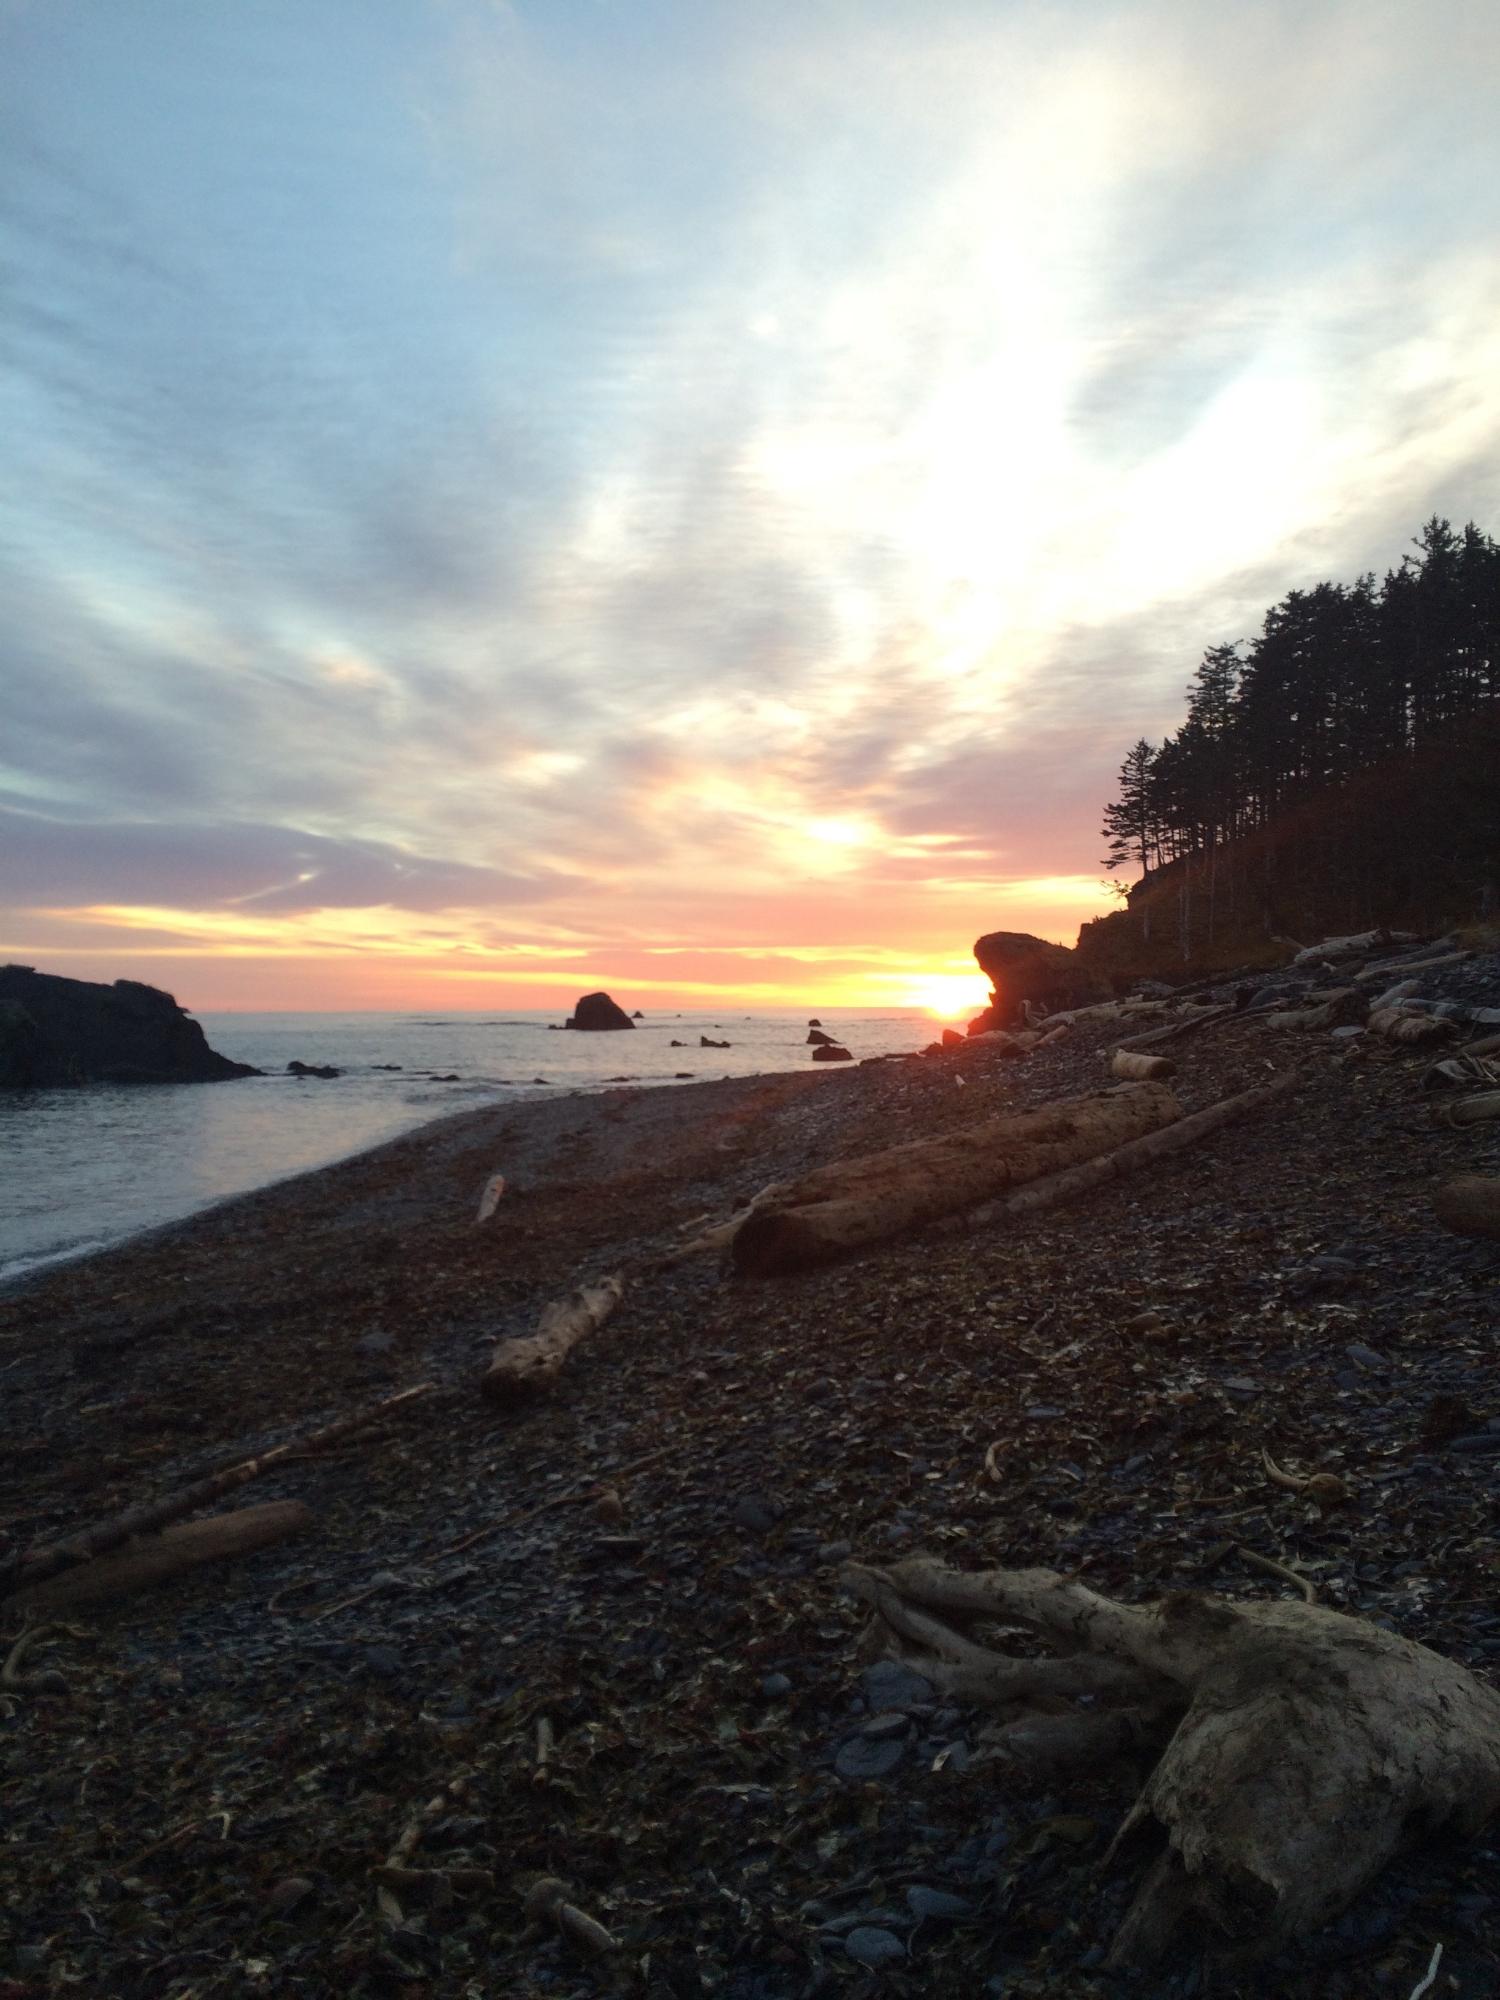 One of the most beautiful sunrises I have ever seen in Kodiak, Alaska!